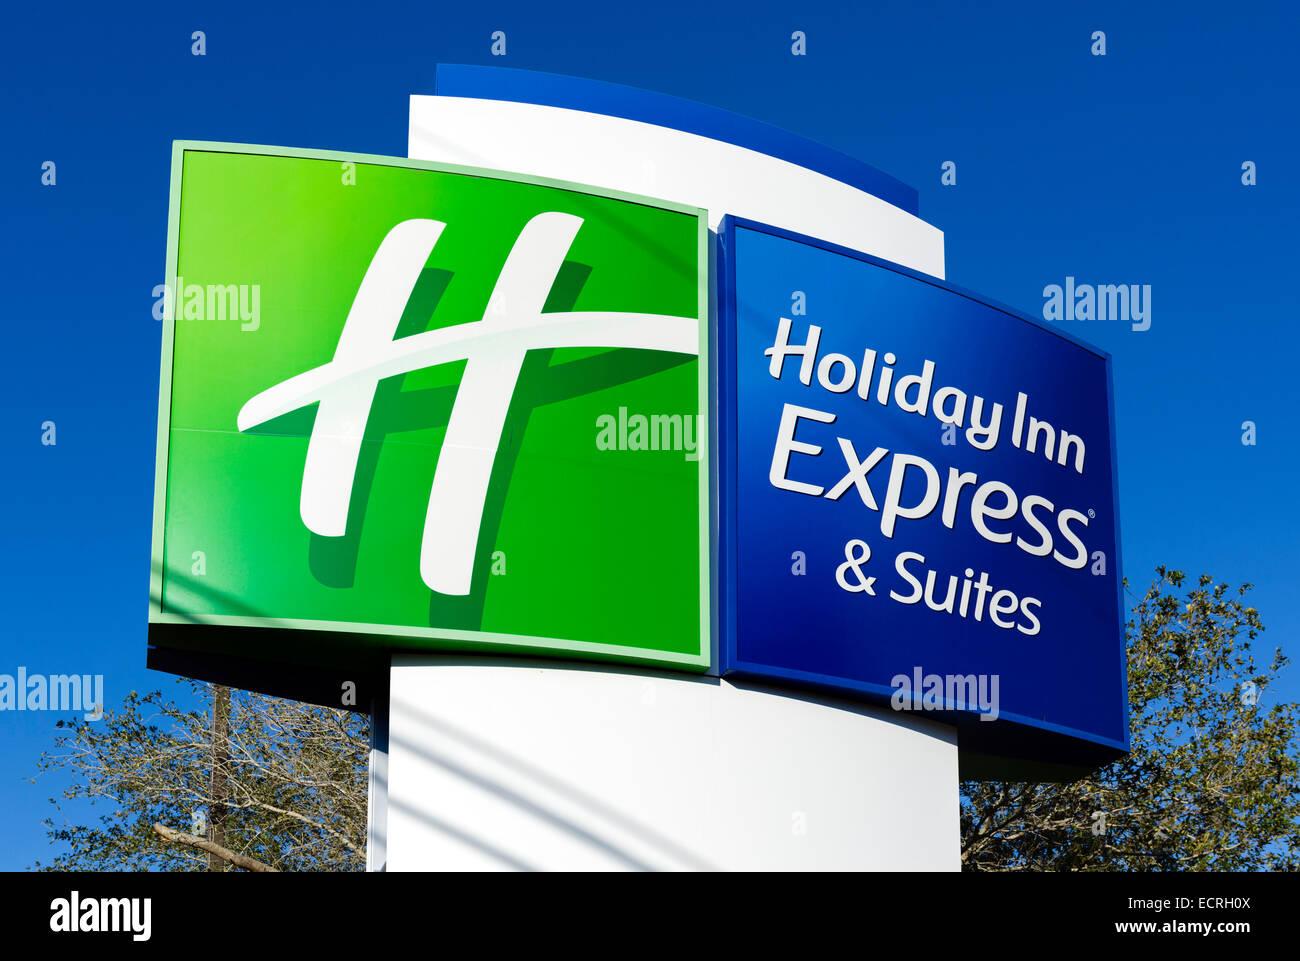 Holiday Inn Express sign, USA - Stock Image